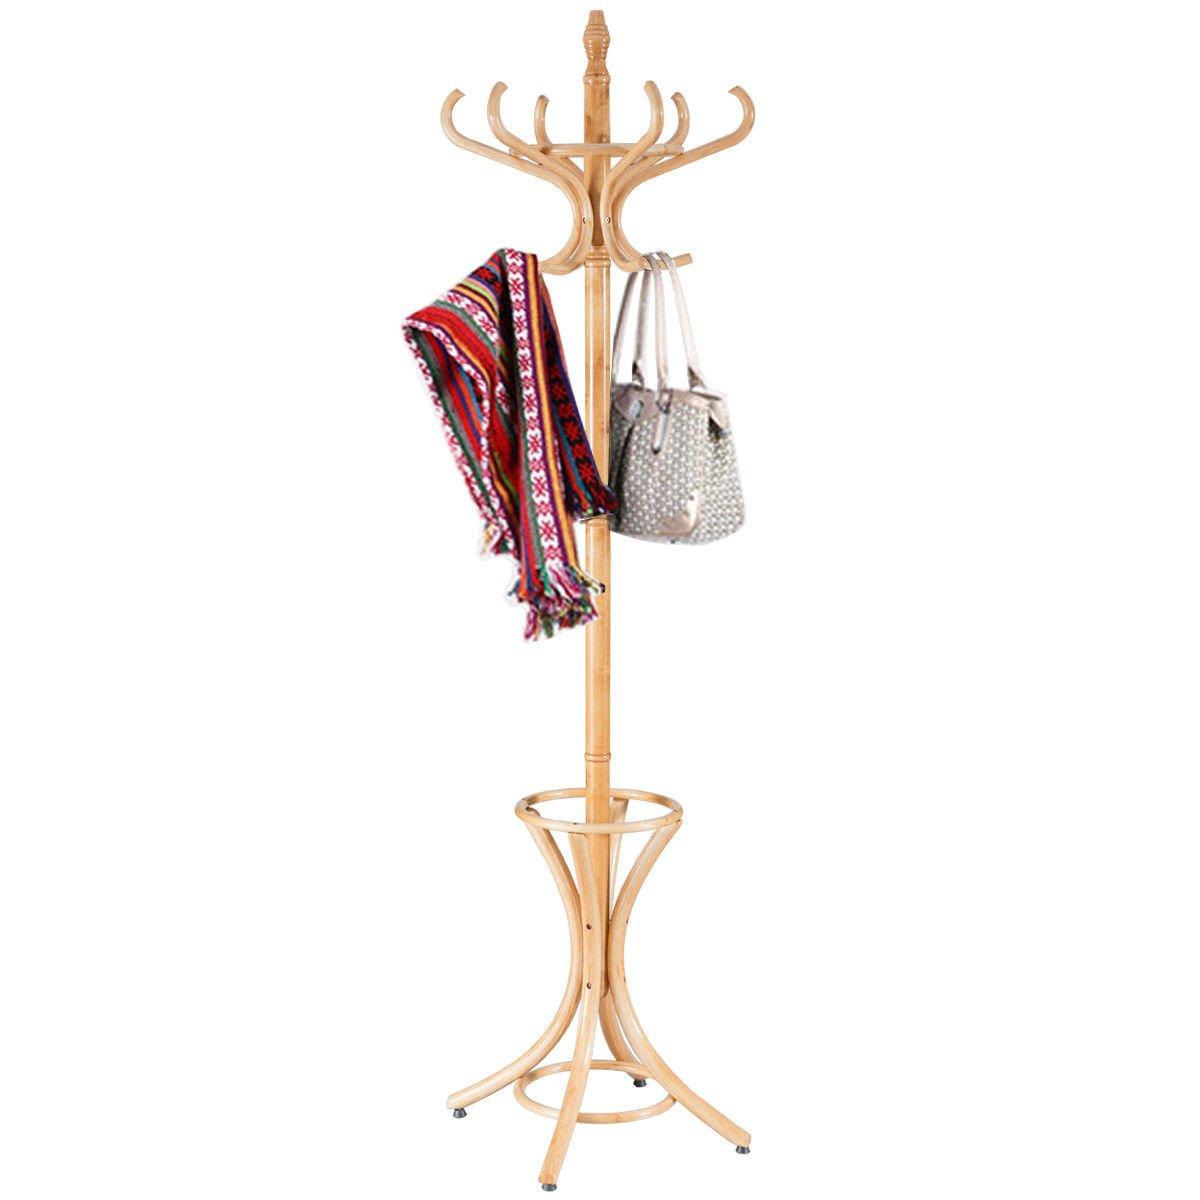 MRT SUPPLY Wood Standing Hat Coat Rack Jacket Bag Hanger Tree 12 Hooks w/Umbrella Stand with Ebook